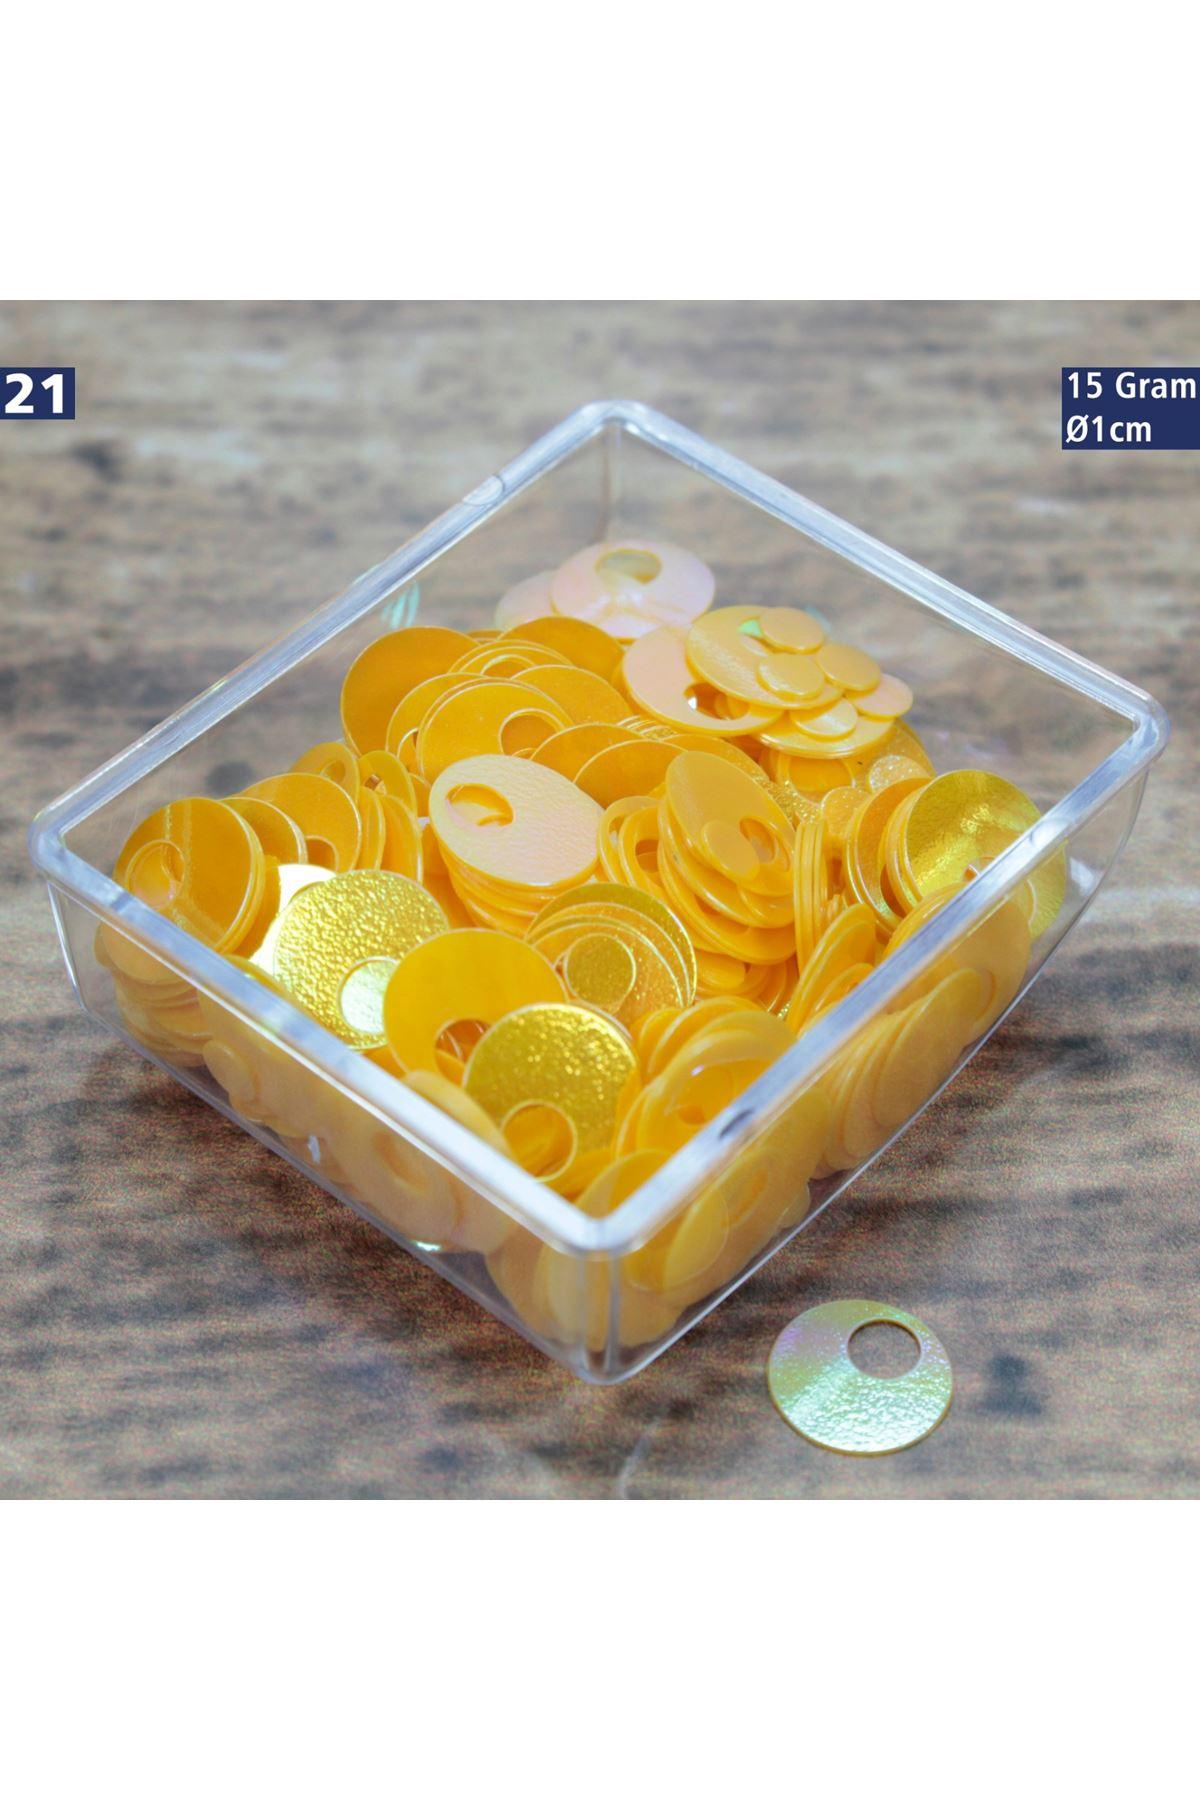 Patik Pulu 15 gram -21